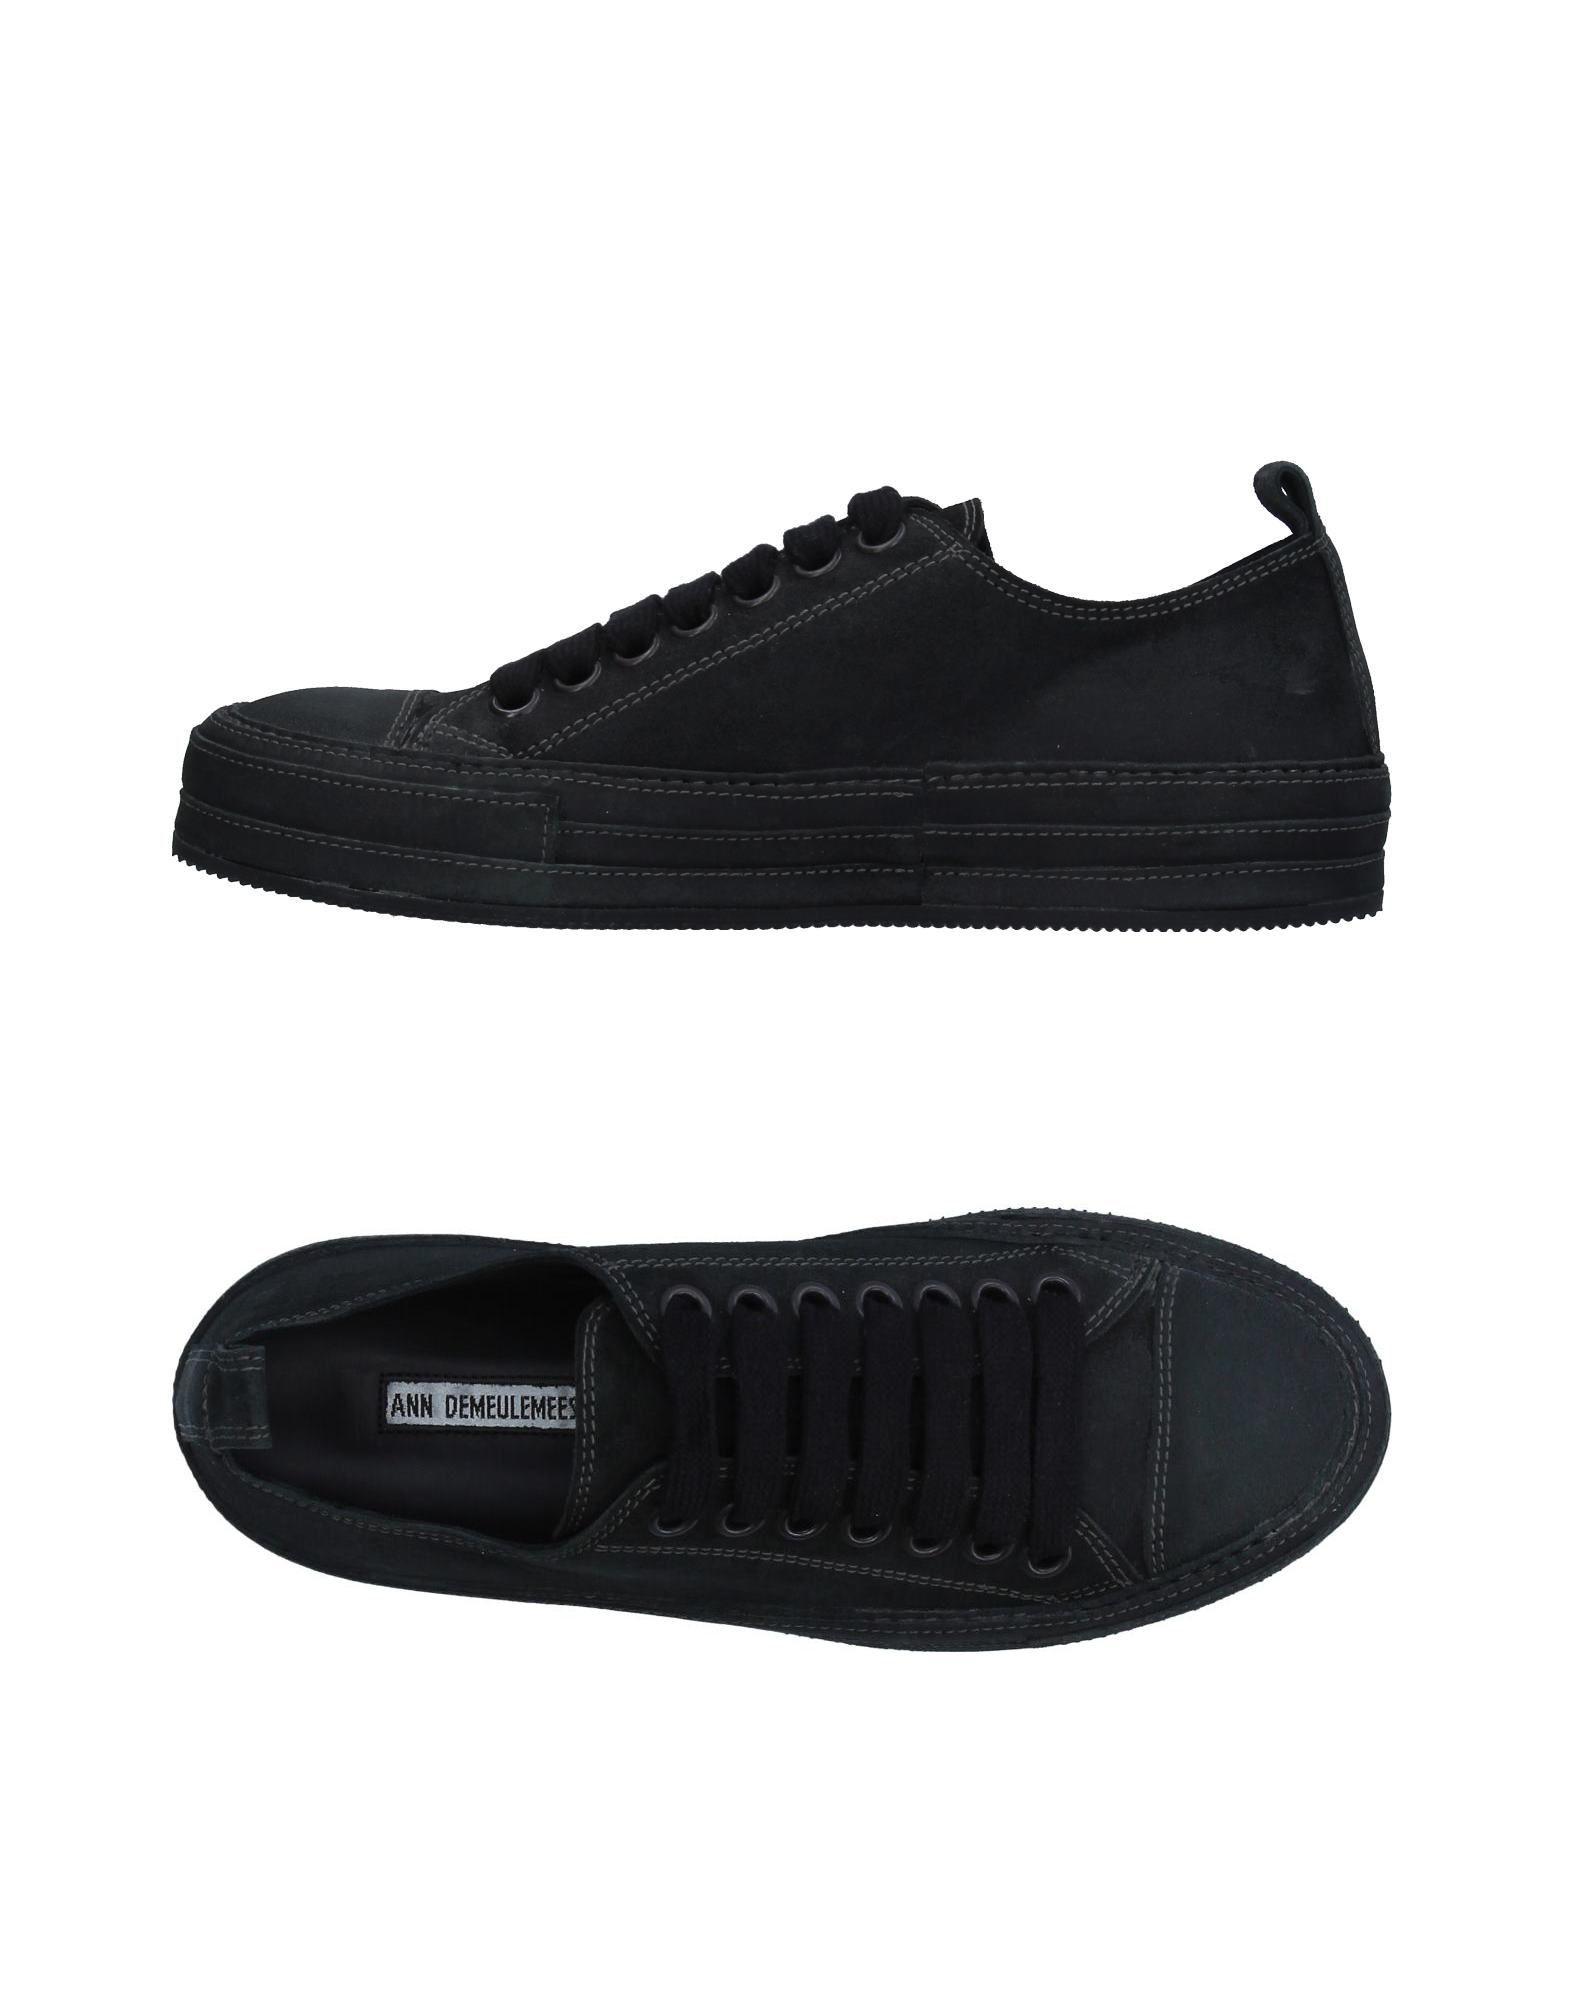 Ann Demeulemeester Sneakers Damen  11330173EIGut aussehende strapazierfähige Schuhe